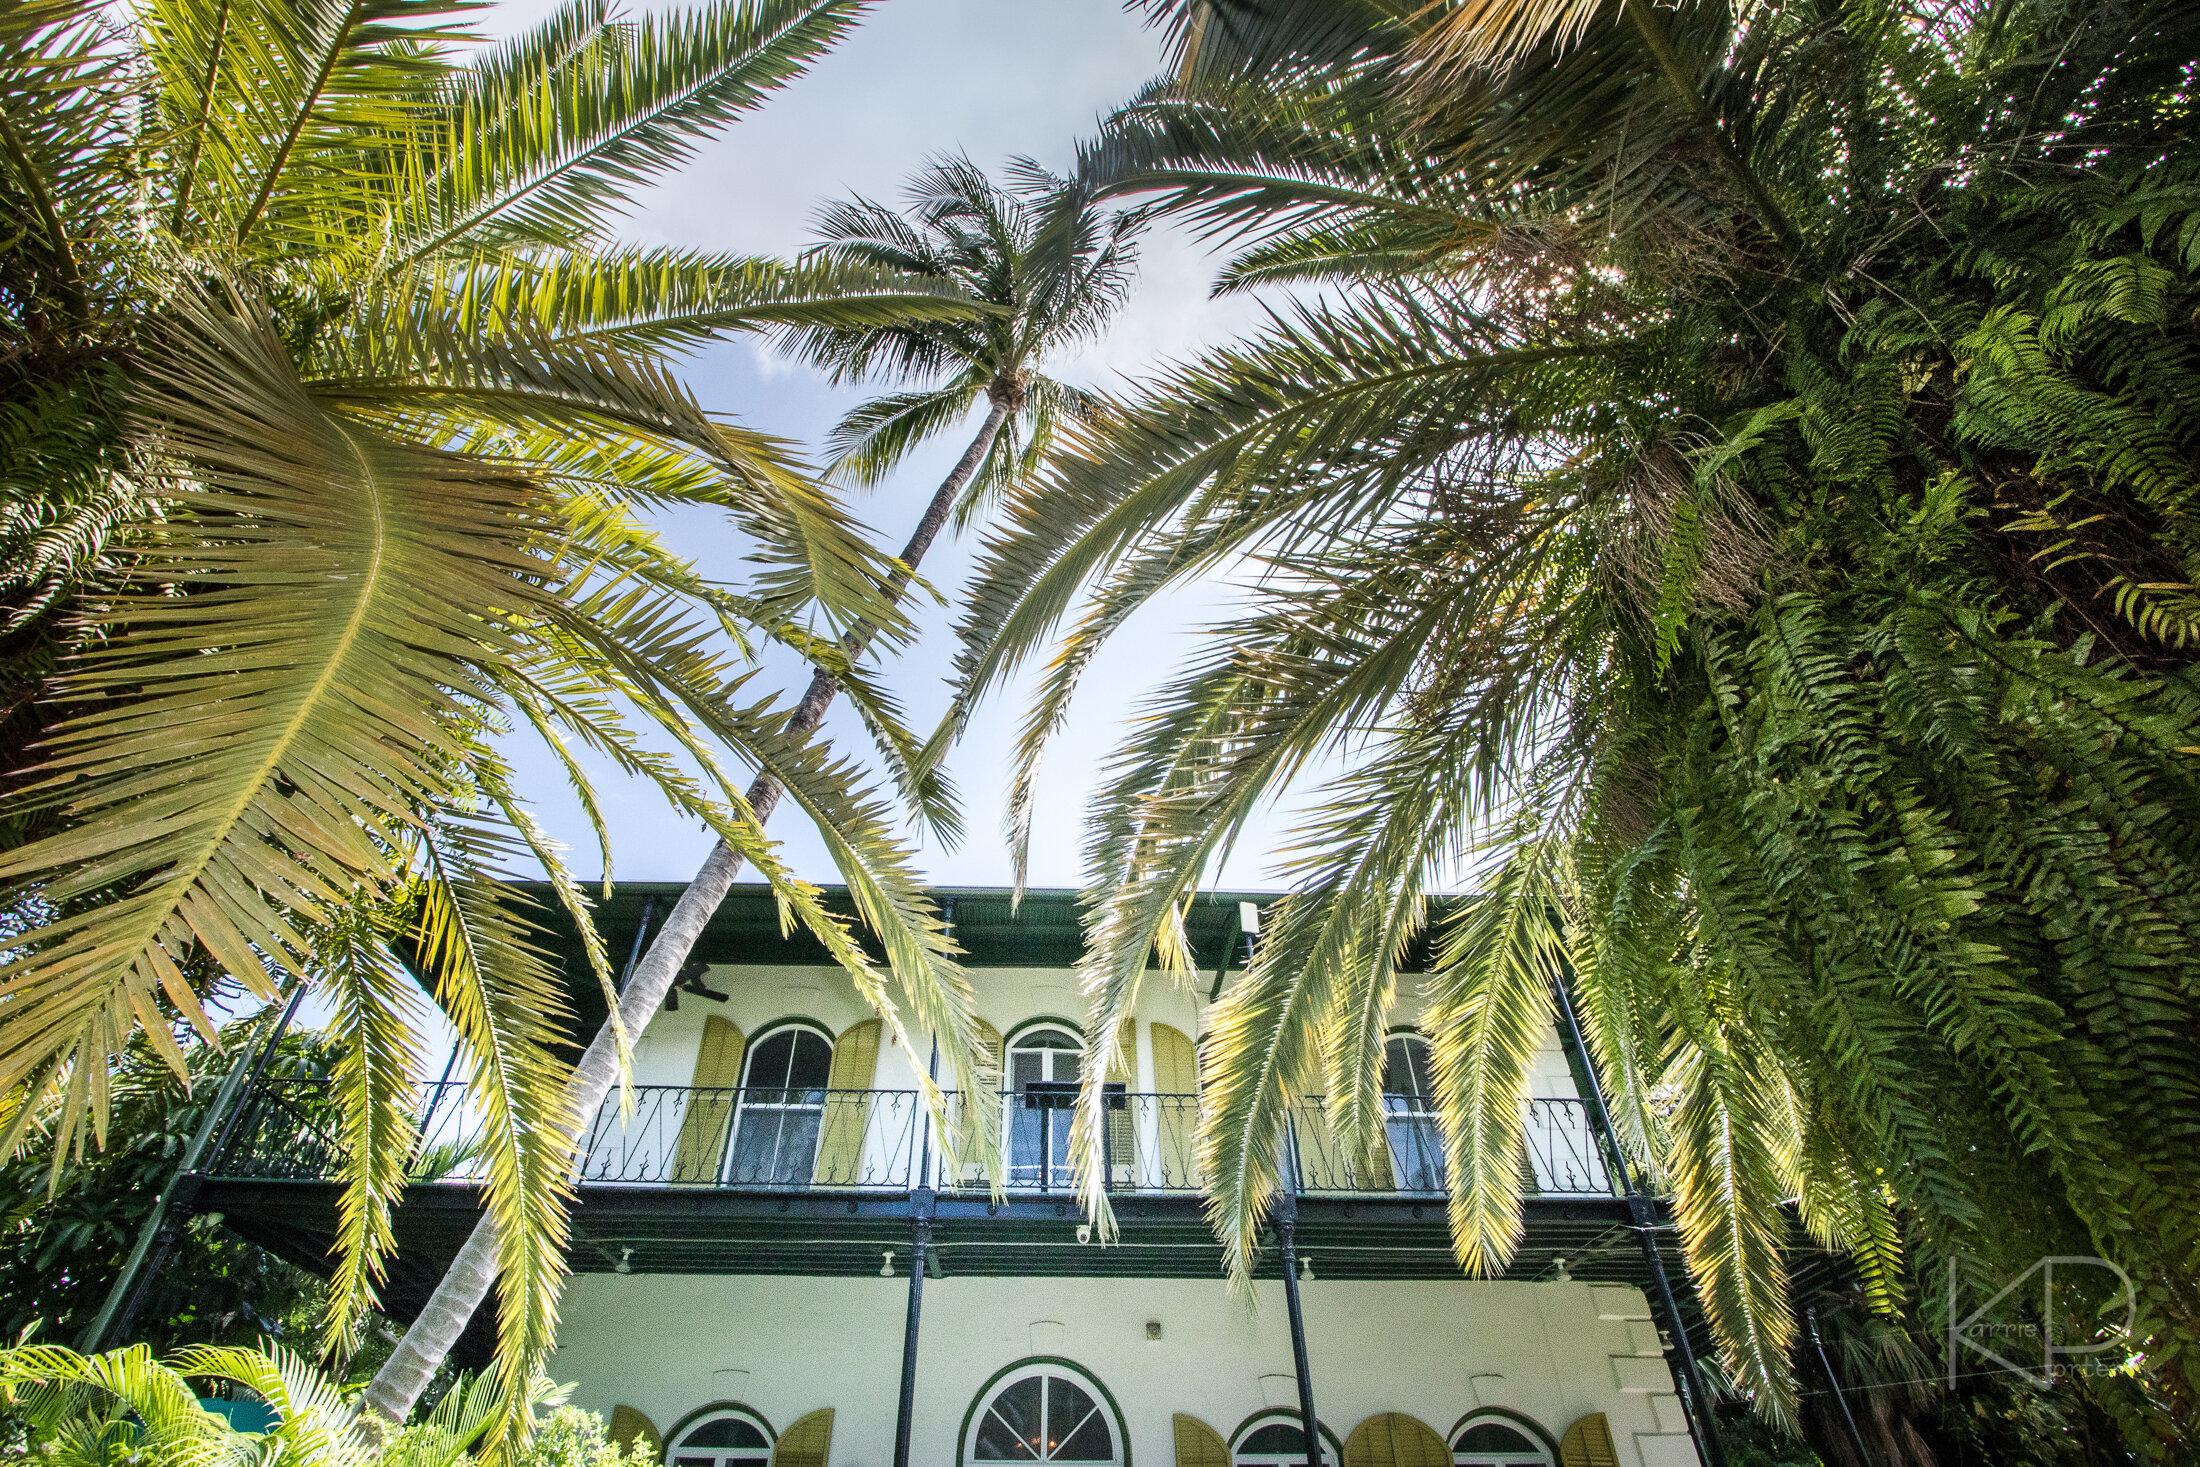 Hemingway Home and Museum